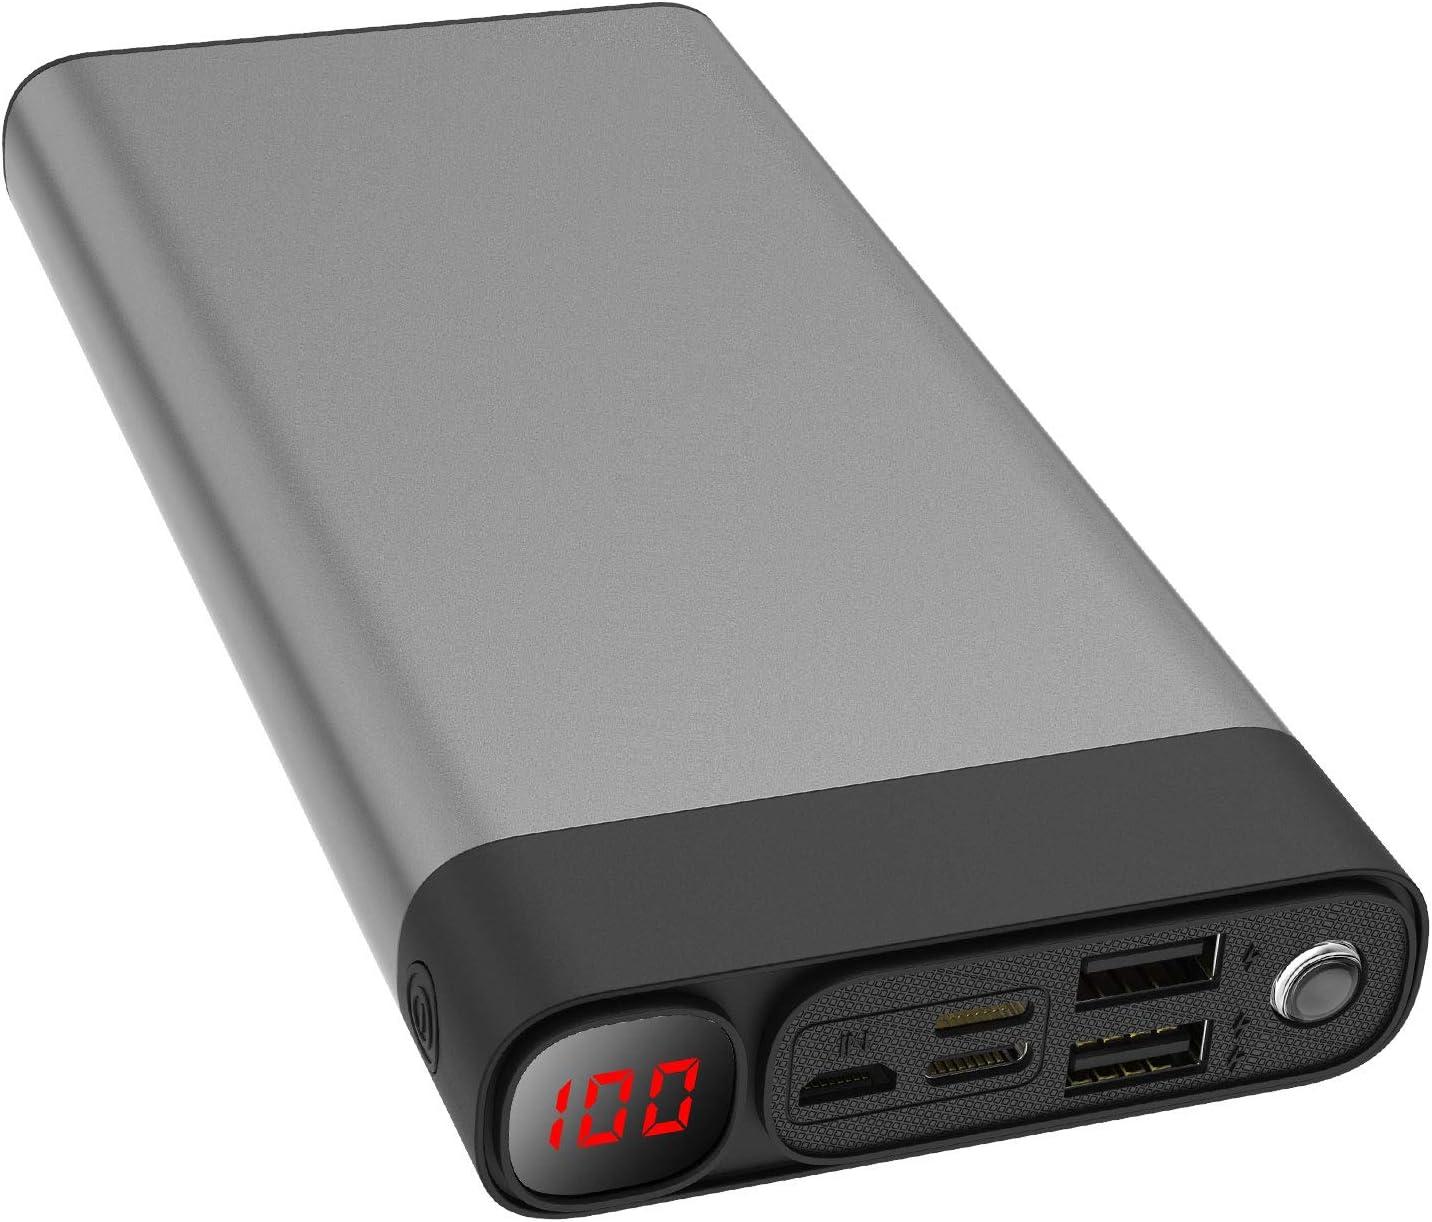 Portable Charger 30000mAh 2USB Ports/Super Bright Flashlight Portable Charger Quick Charge Phone Pad (Black 30000mAh)